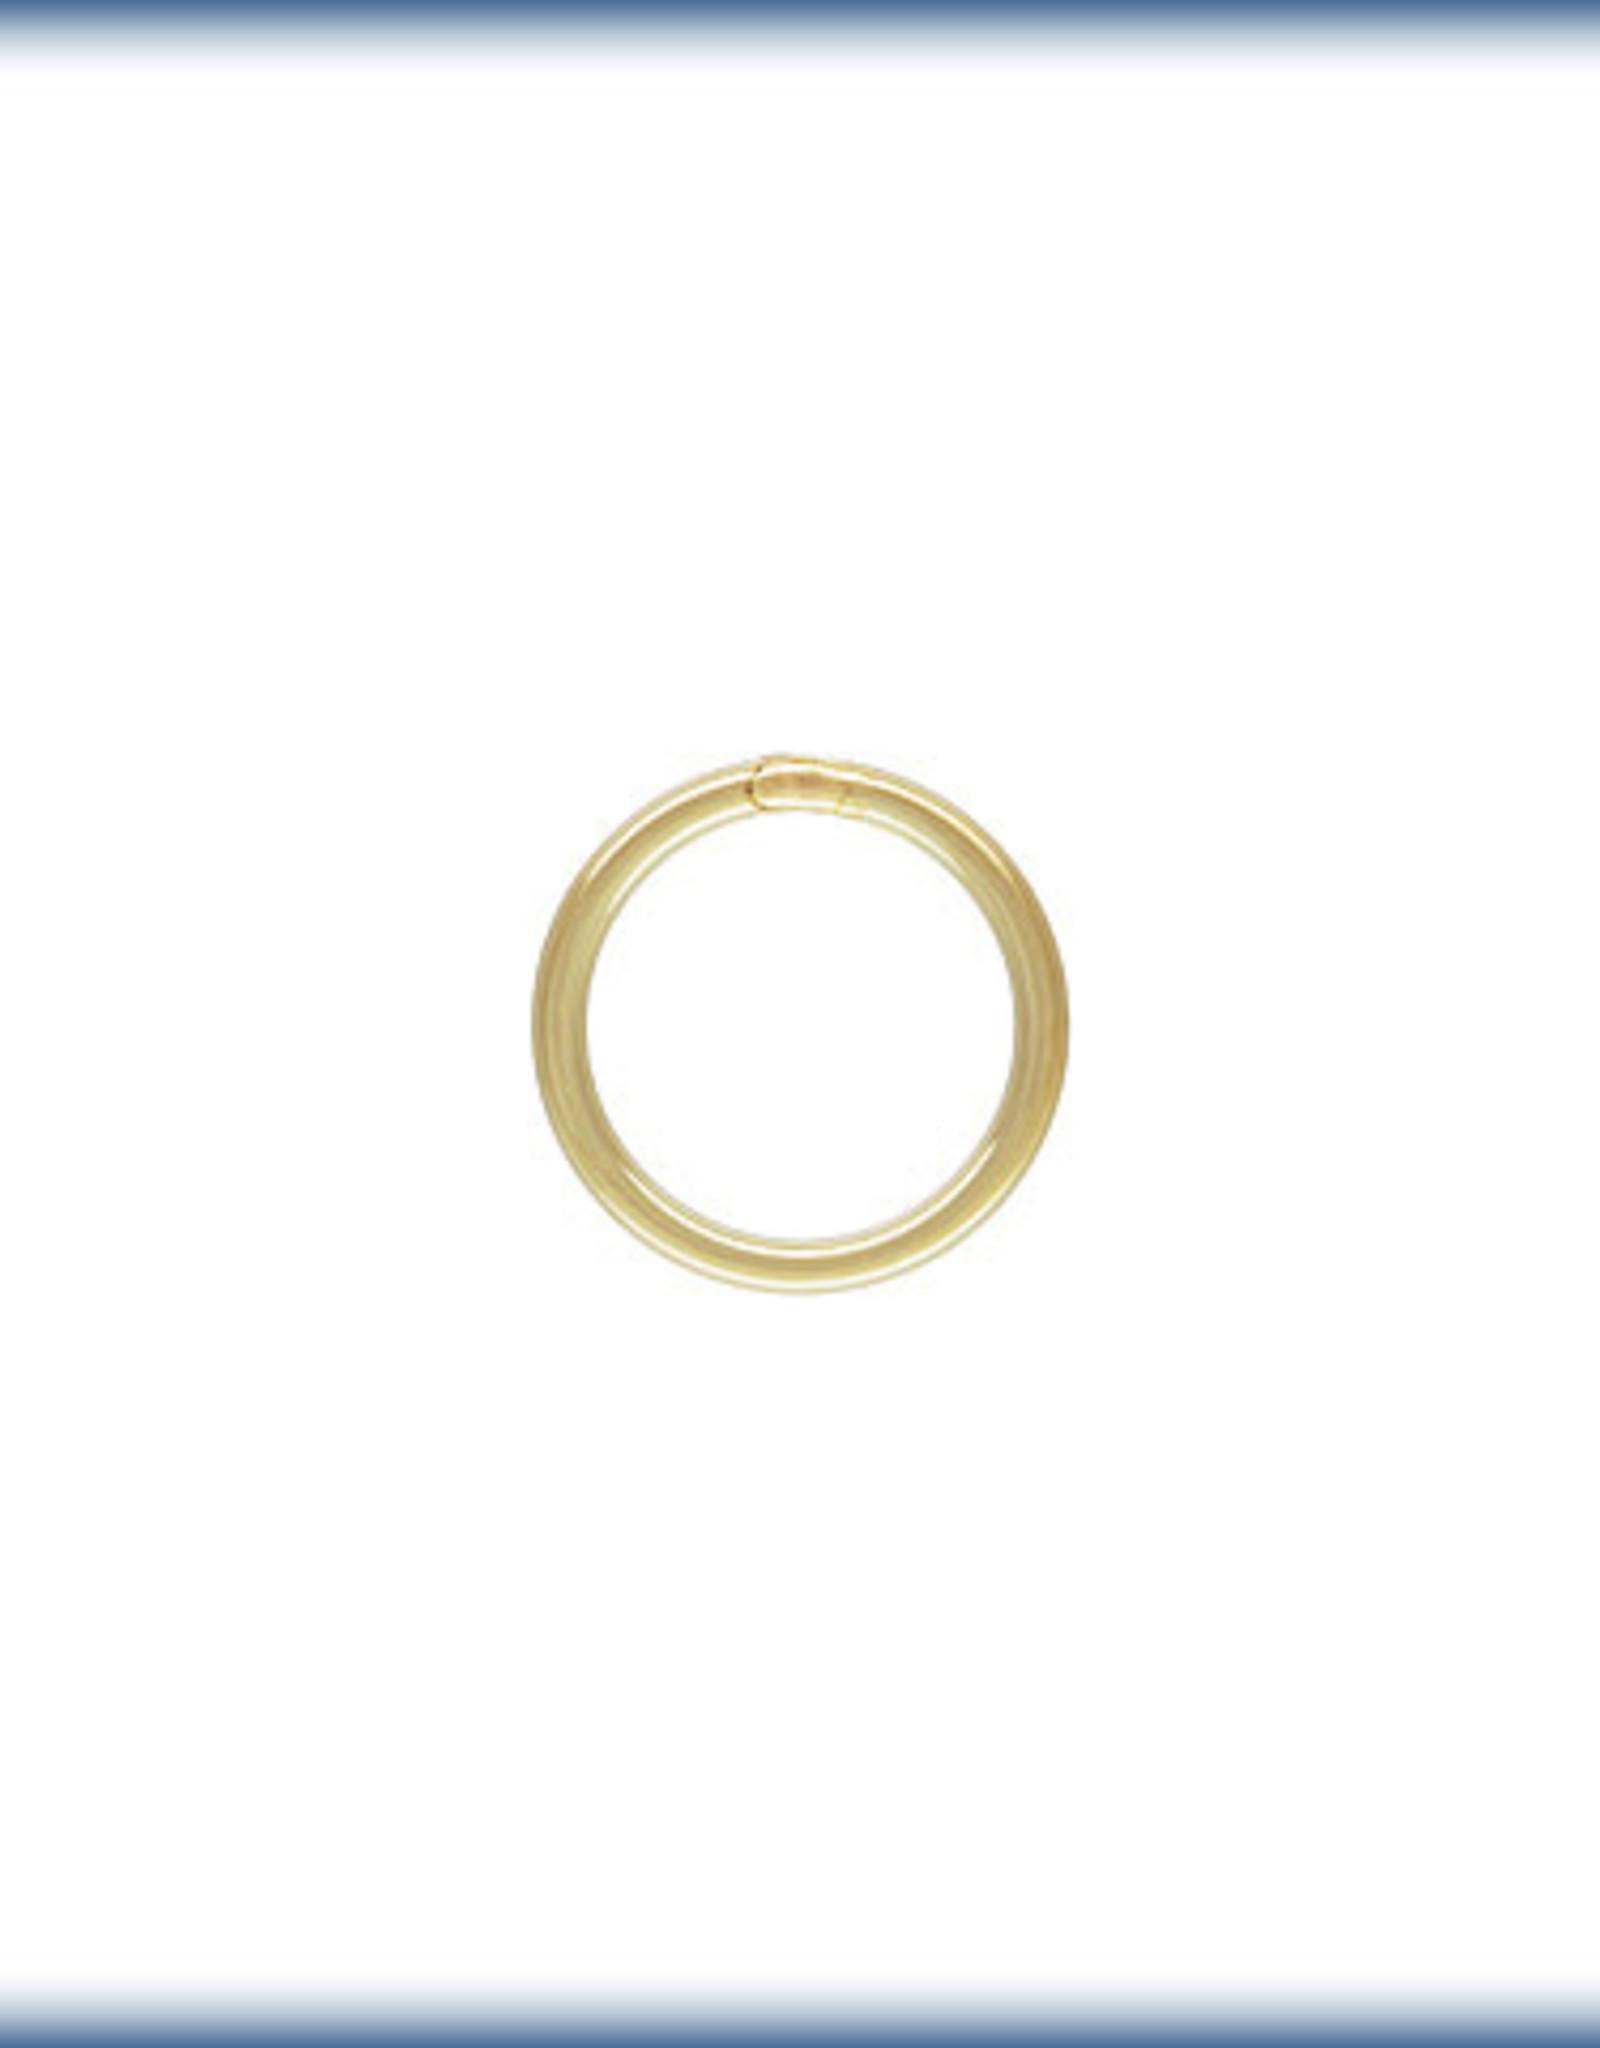 6mm Closed Ring 20 ga 14k Gold Filled Qty 10